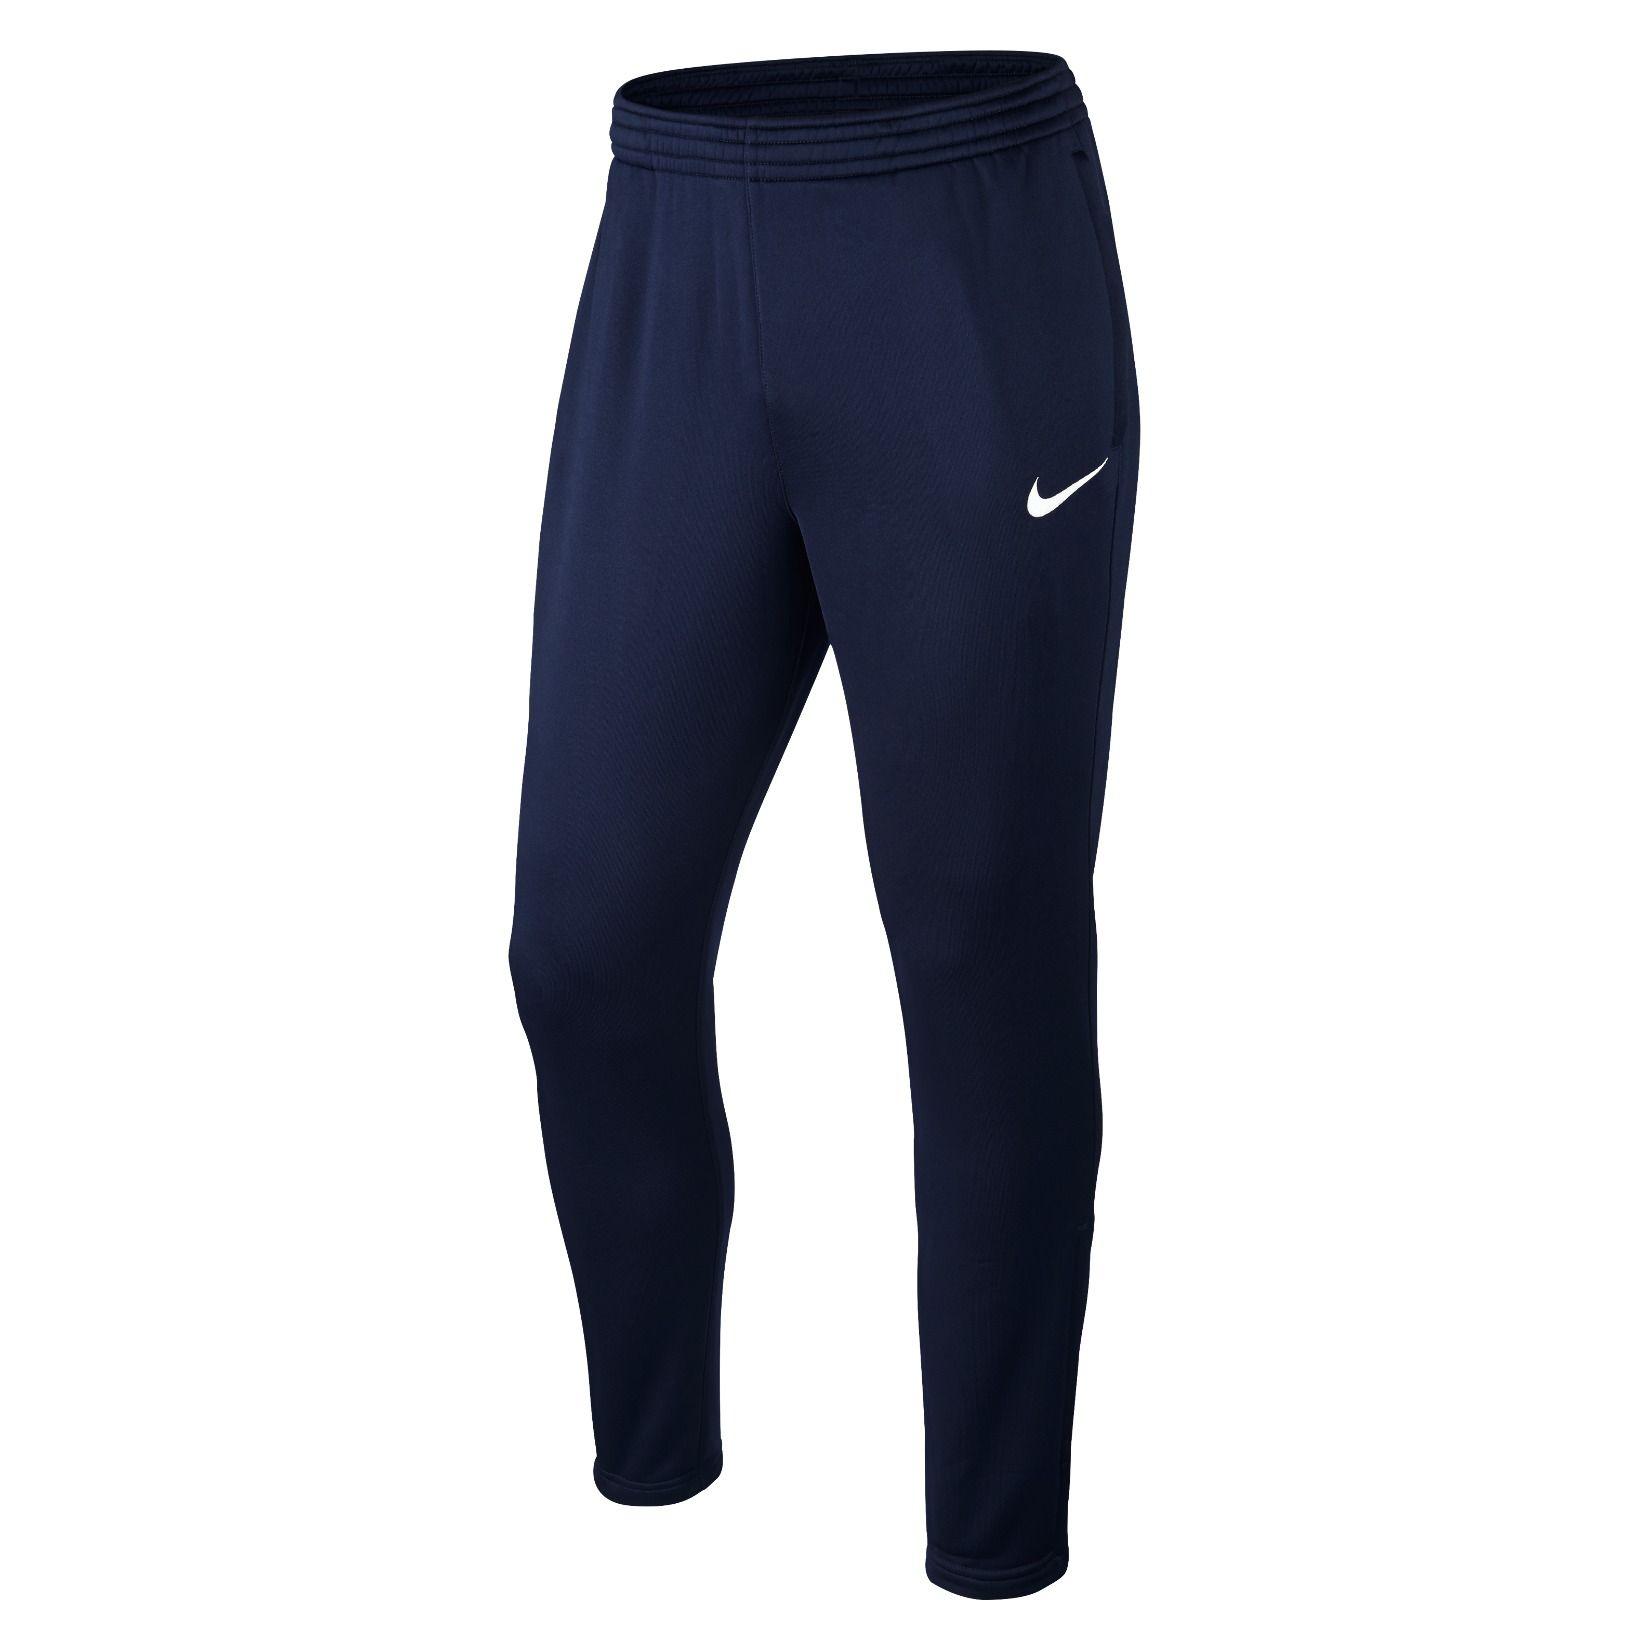 castle bangor academy18 tech pants sizes xl boys 21475 p